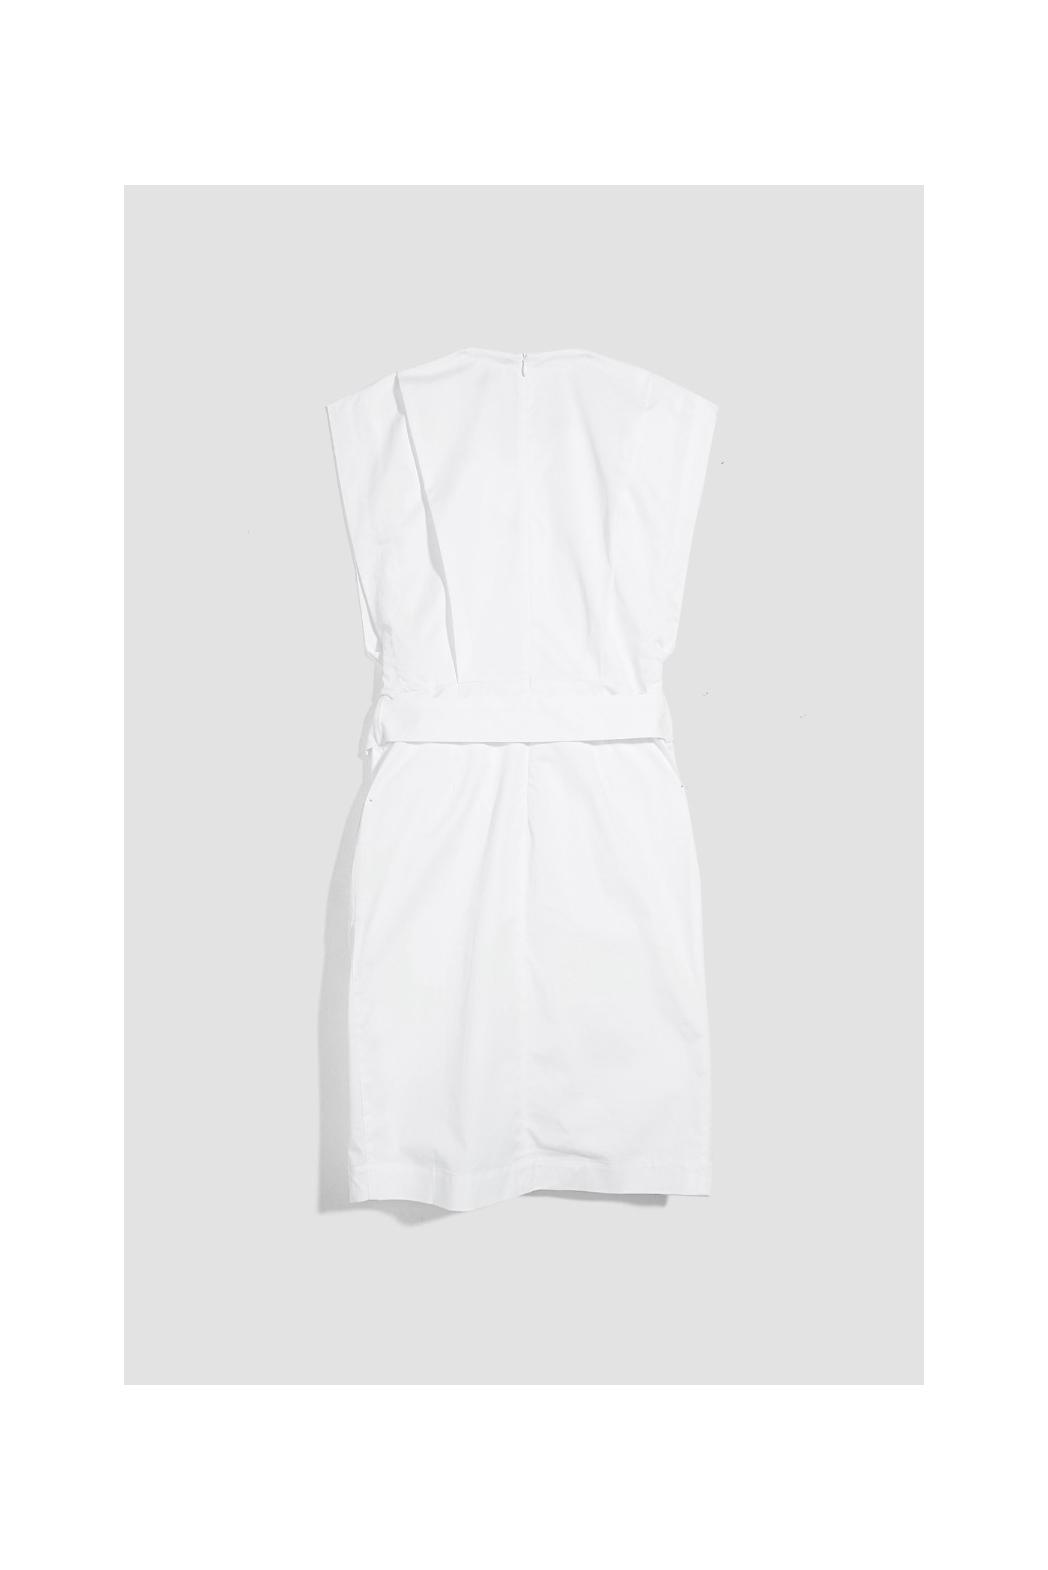 Đầm xếp li thân trước. Cotton twill silk - 10F20DREW013